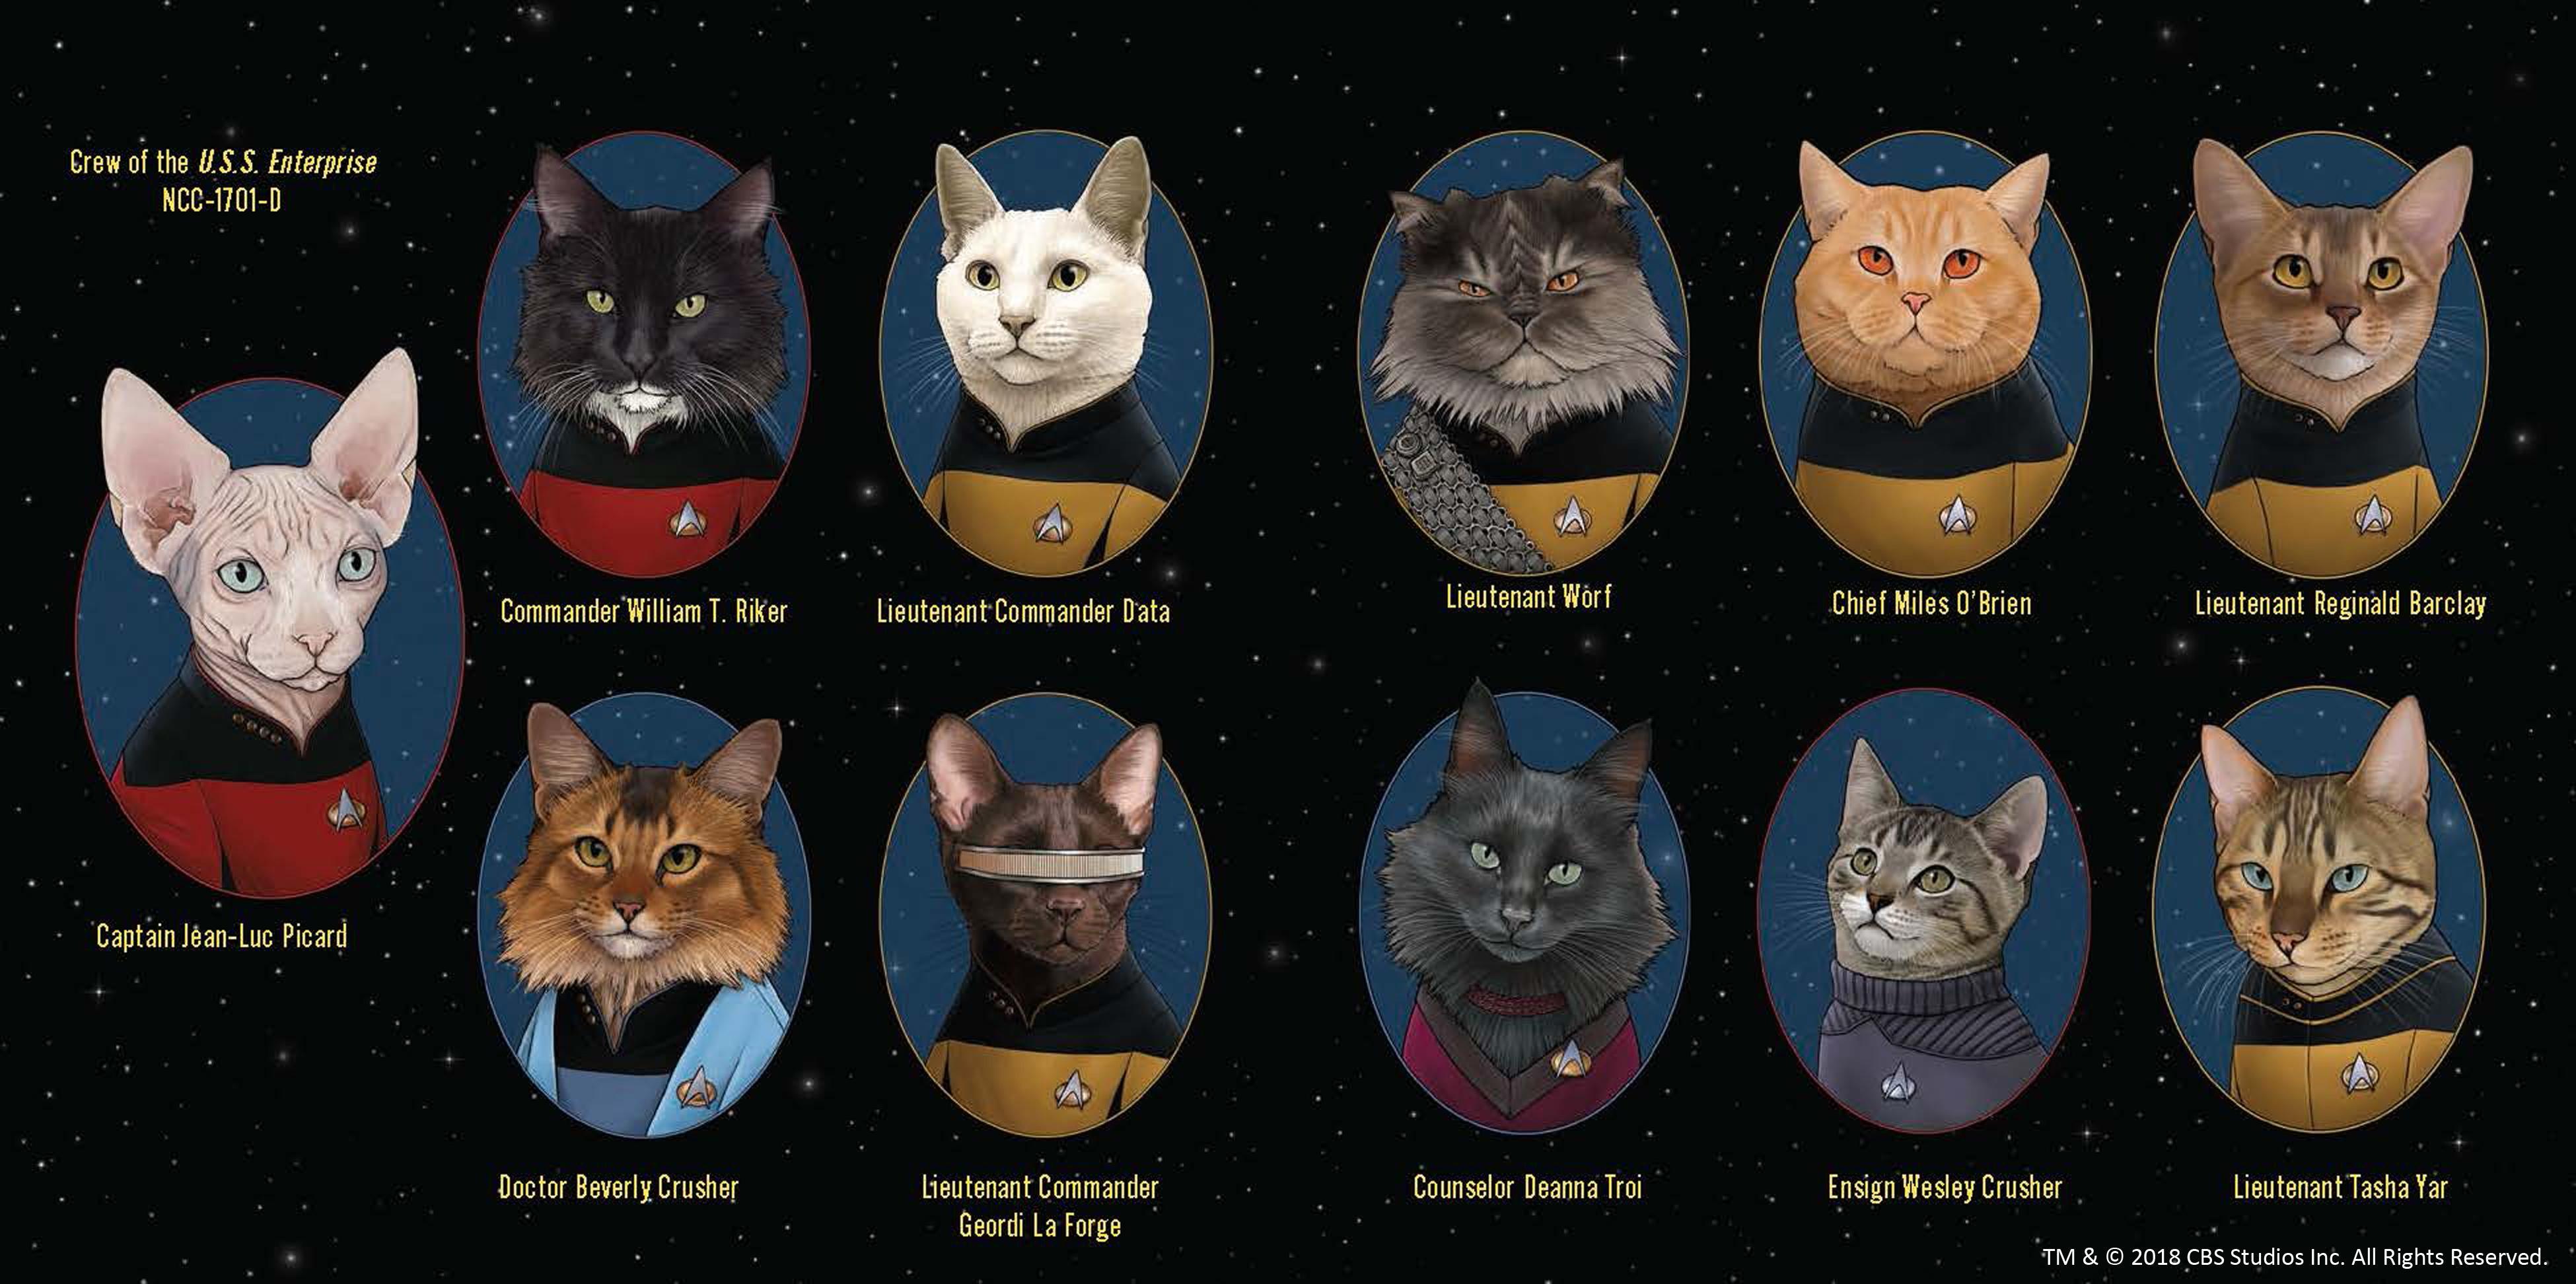 Amazon.com: Star Trek: The Next Generation Cats: (Star